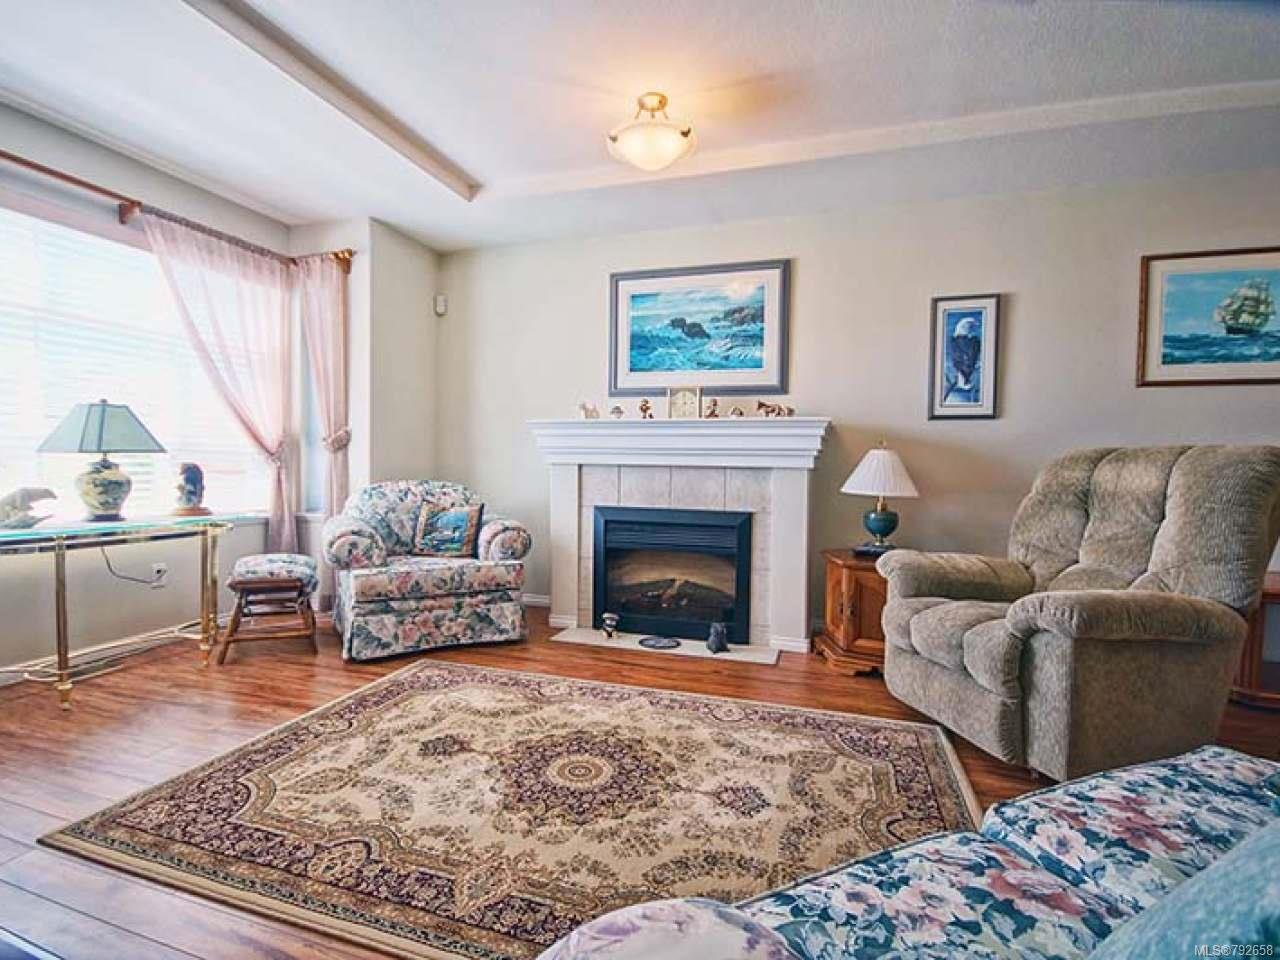 Photo 3: Photos: 893 EDGEWARE Avenue in PARKSVILLE: PQ Parksville House for sale (Parksville/Qualicum)  : MLS®# 792658